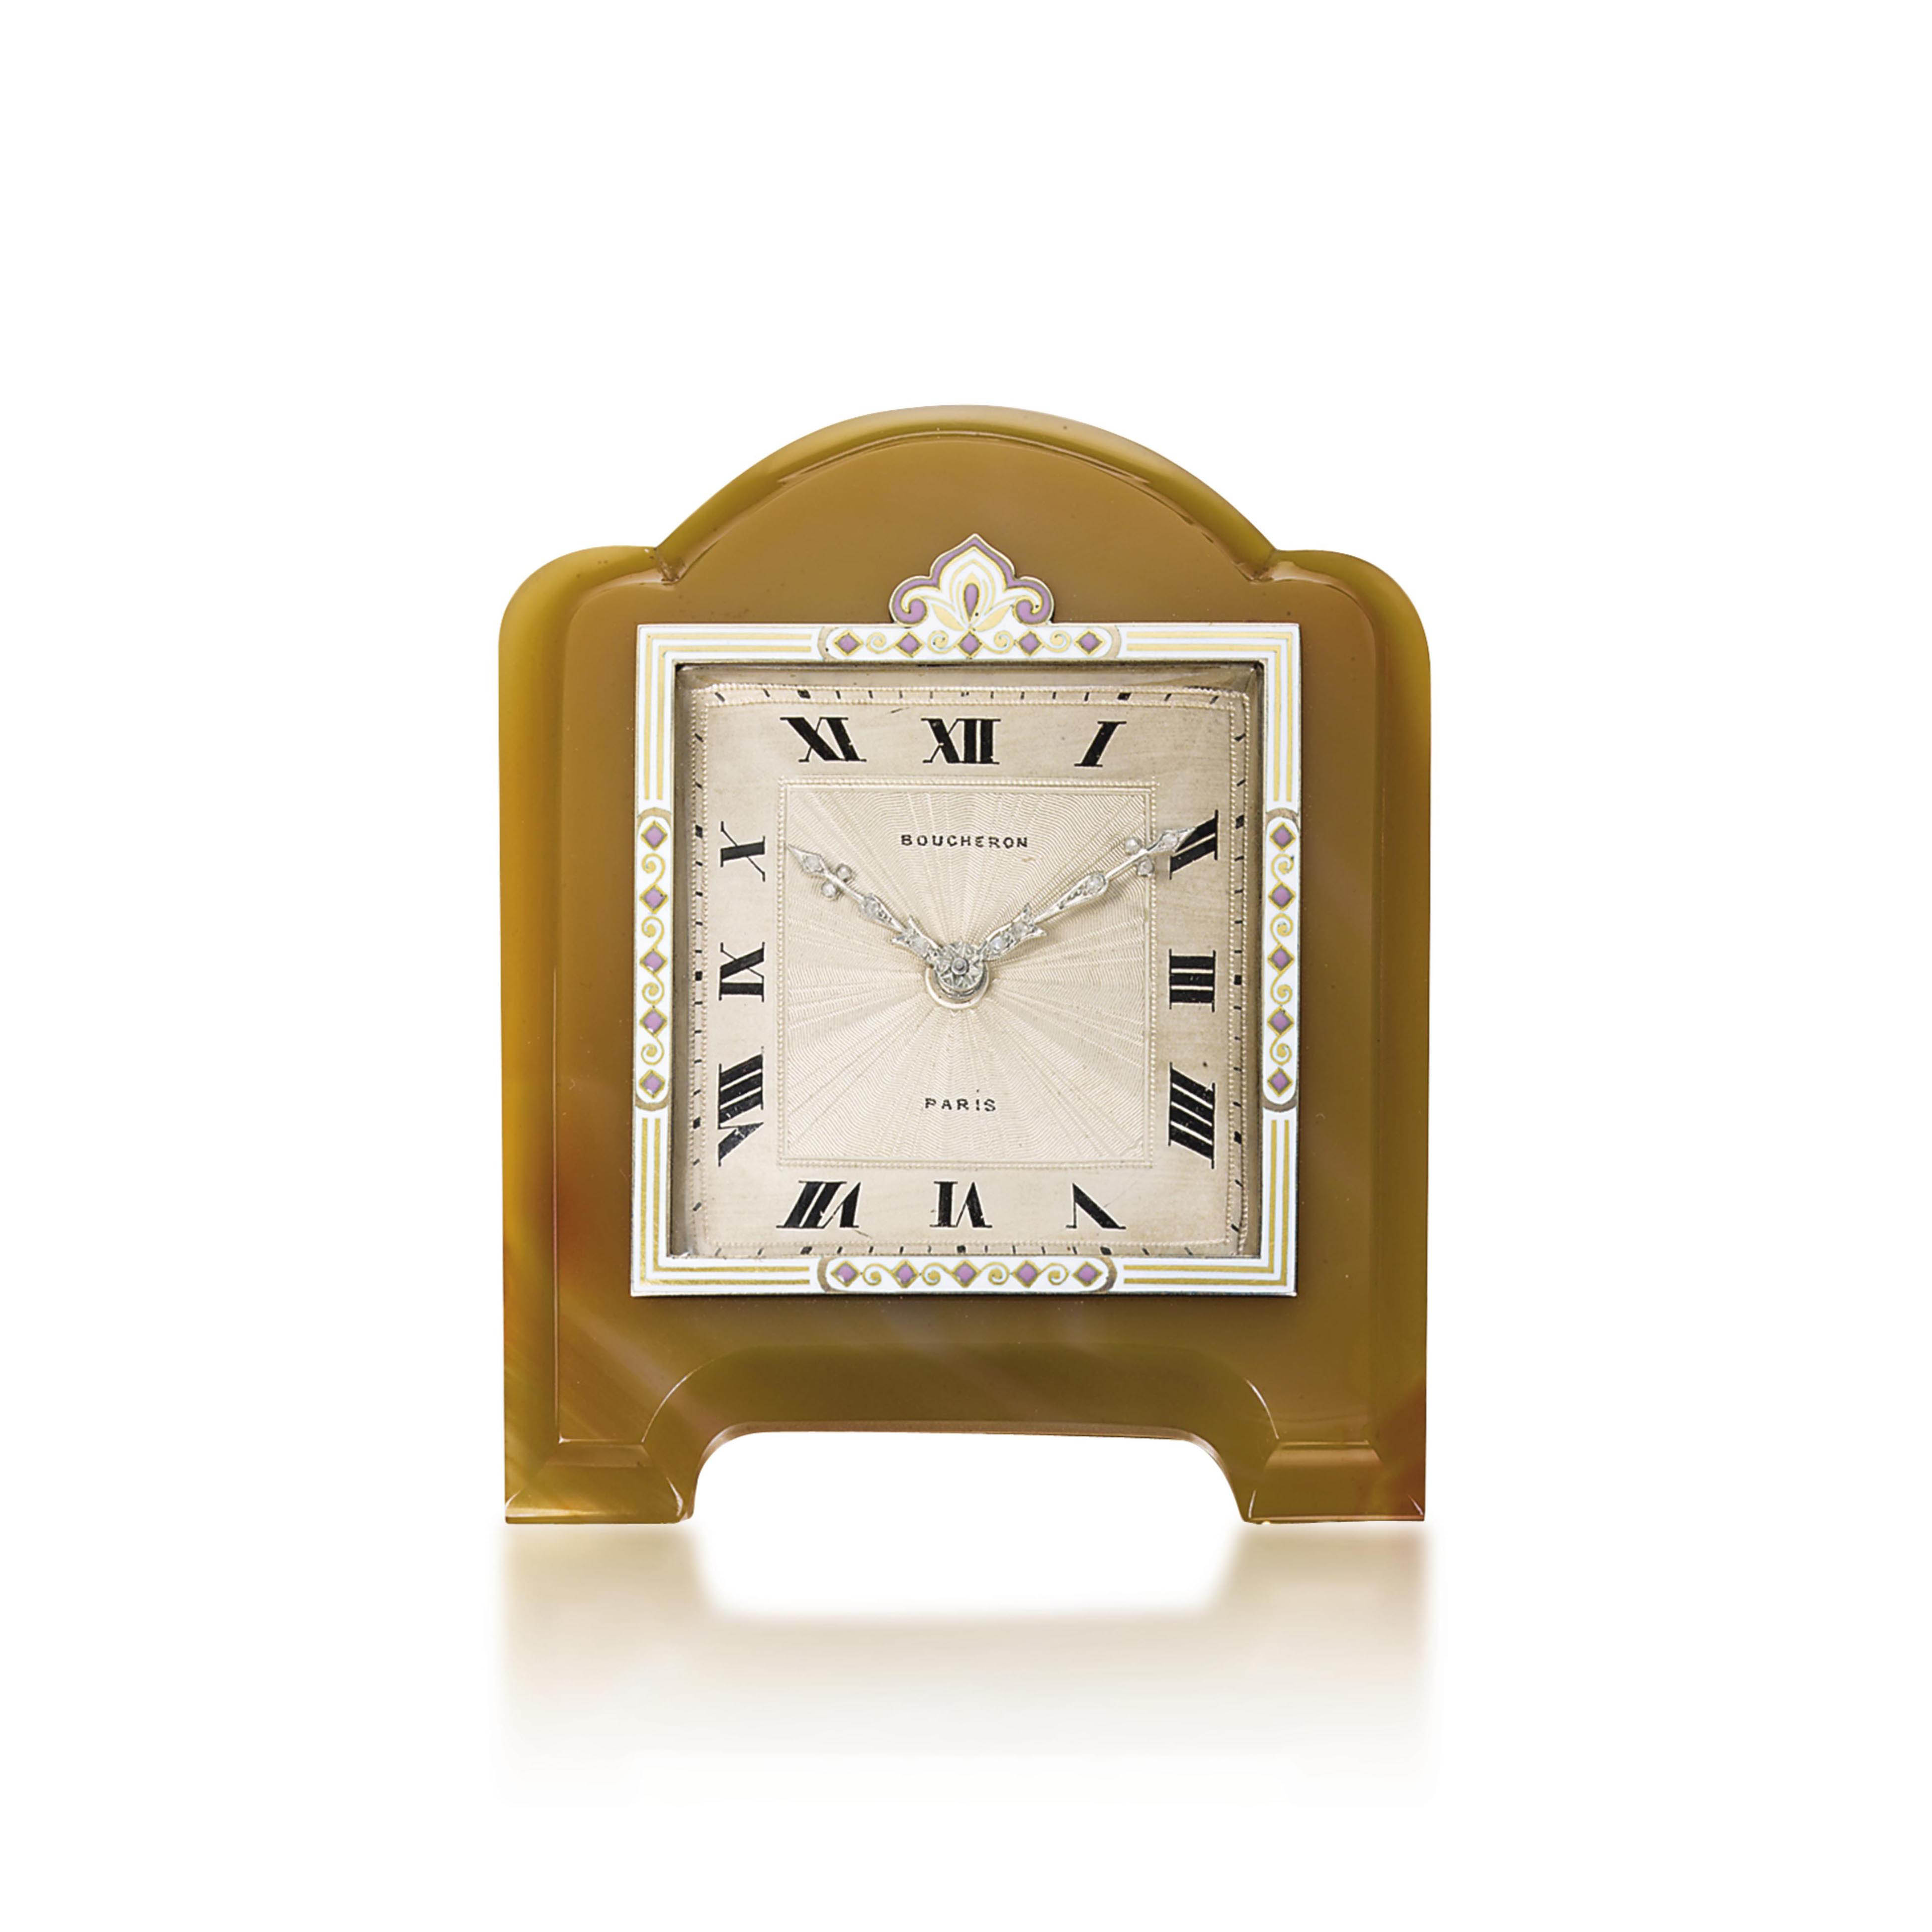 AN AGATE AND ENAMEL DESK CLOCK